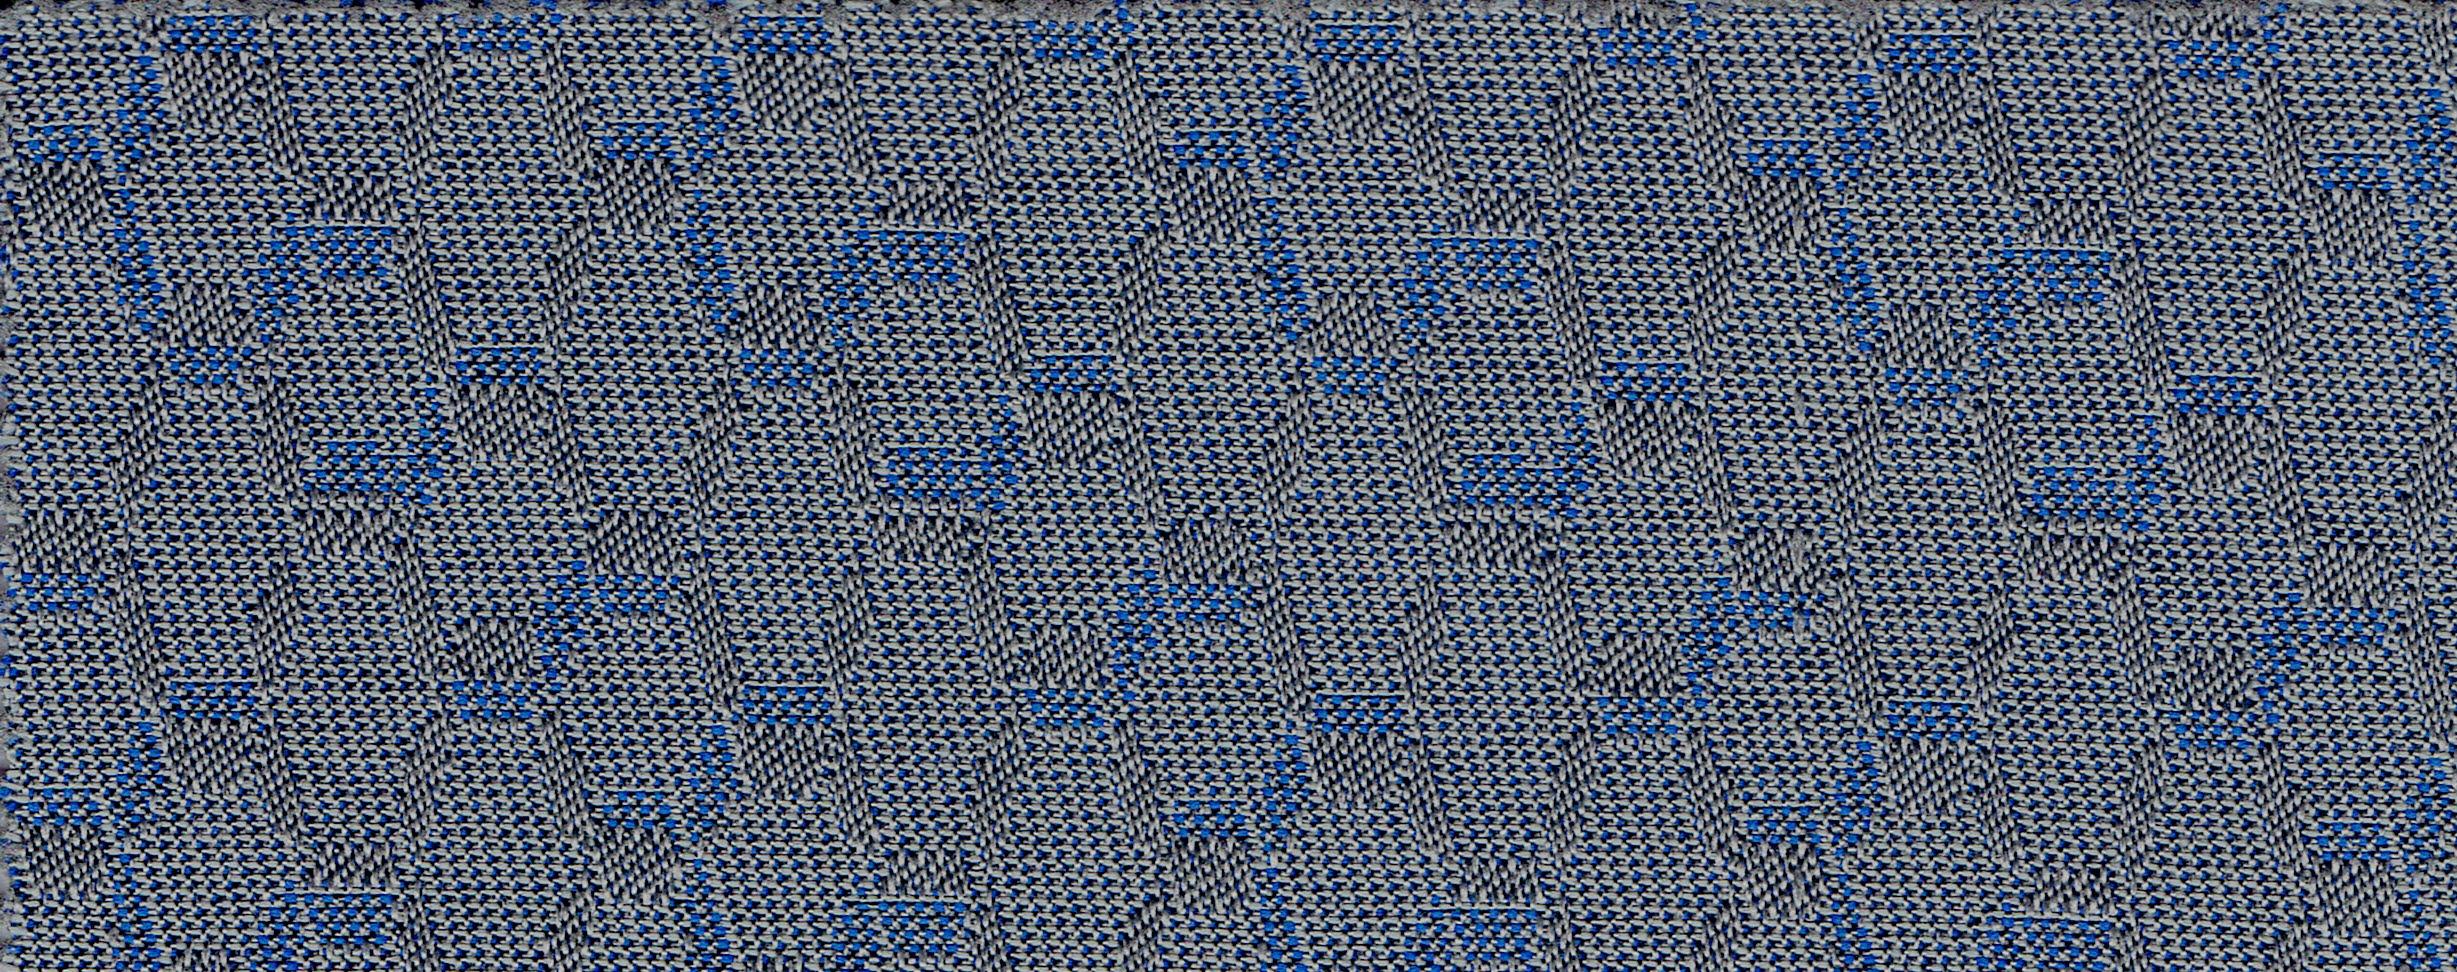 fabric26082015_0014.jpg